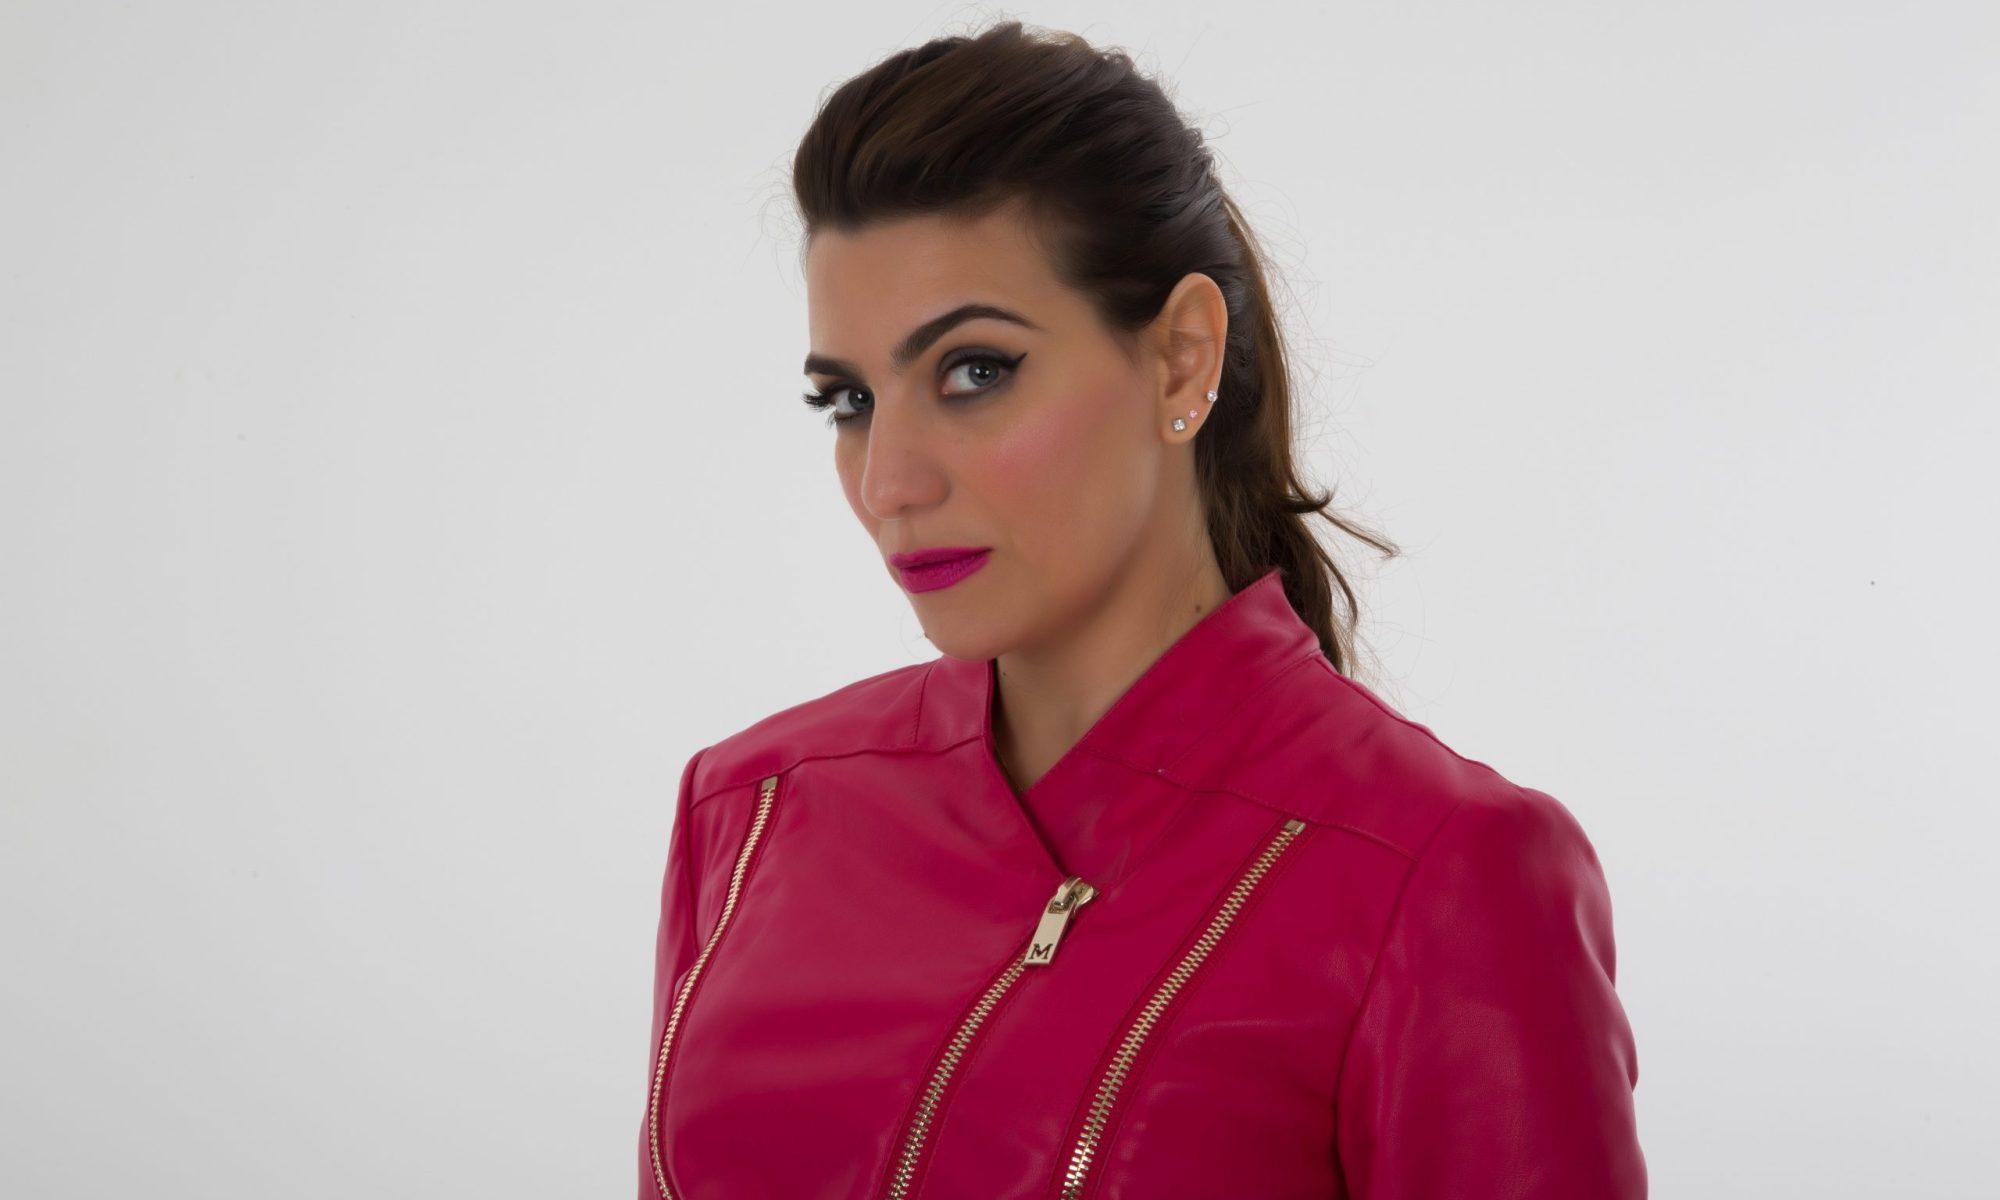 Vera Gallardo international expert on sustainable fashion and beauty